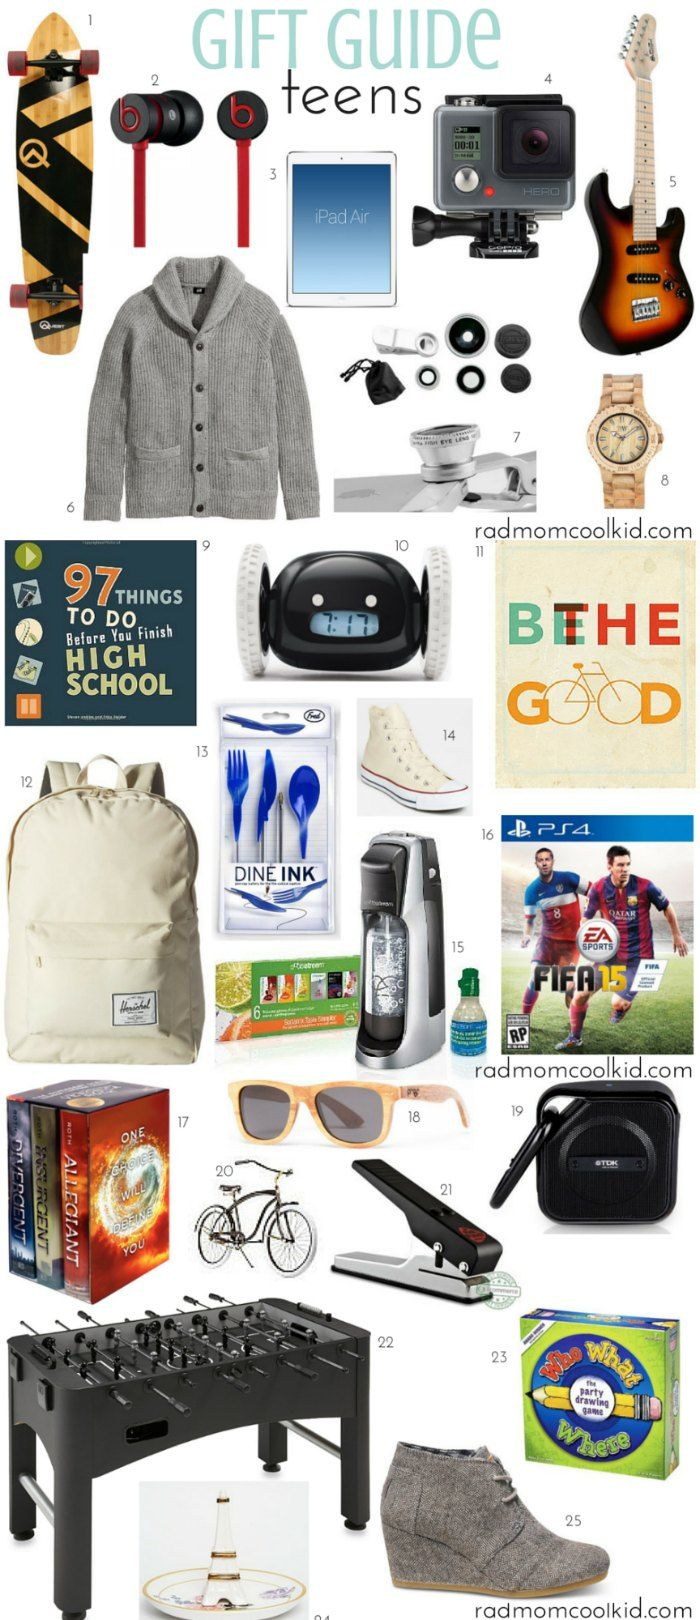 Gift Guide: Teen | Rad Mom Cool Kid | Pinterest | Gifts, Christmas ...